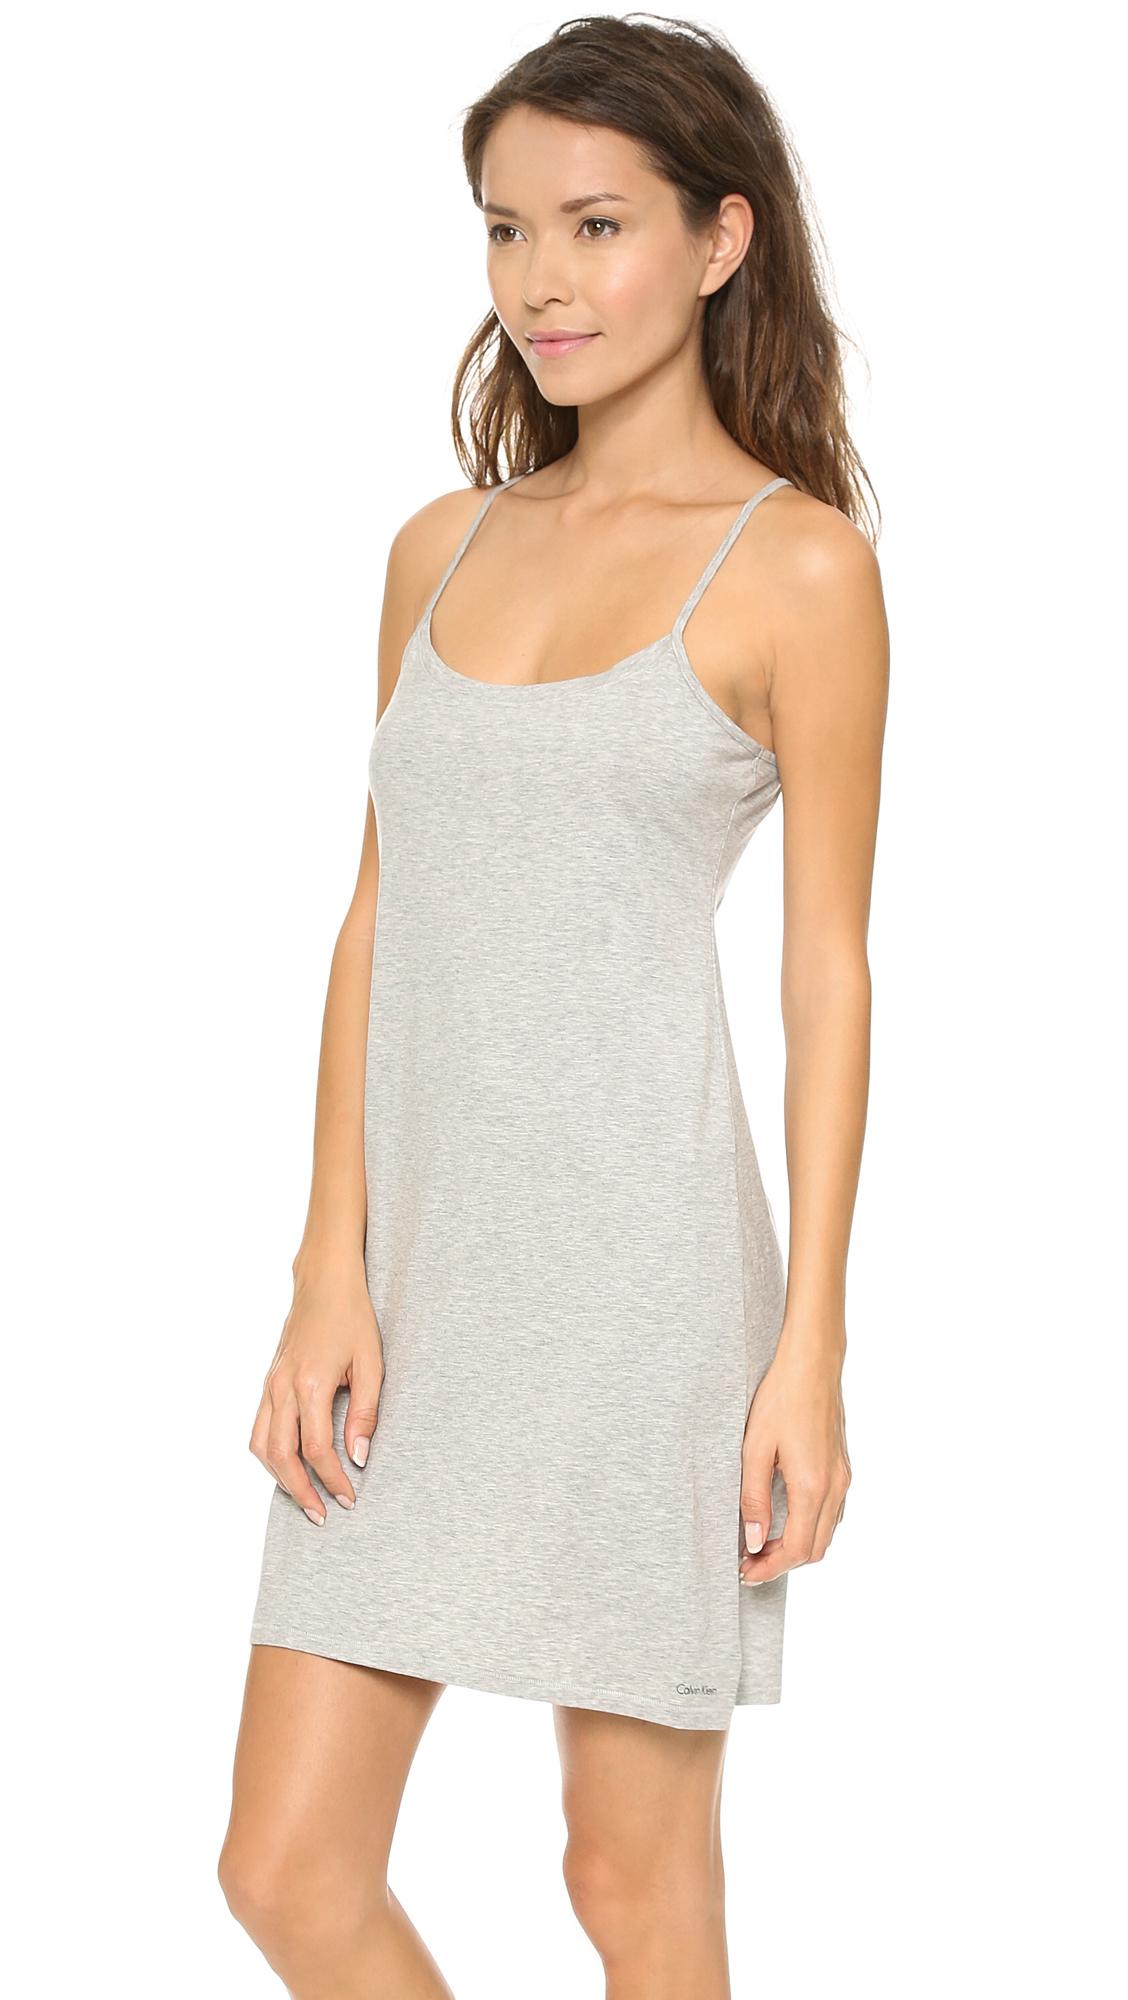 Lyst - Calvin Klein Modern Cotton Night Dress - Grey Heather in Gray e206ba3e6aaf